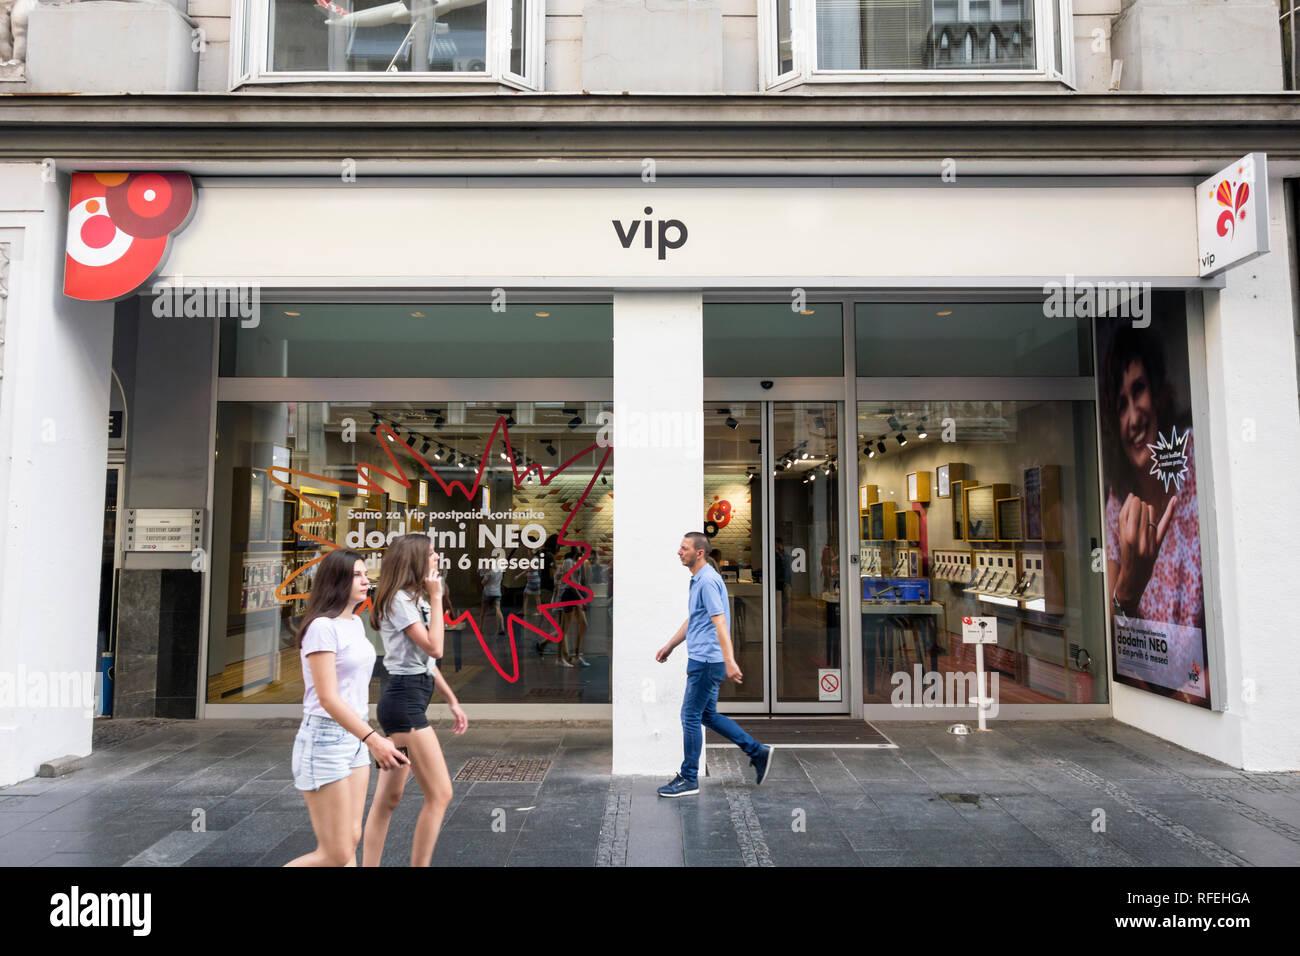 VIP telecom shop in Belgrade, Serbia - Stock Image